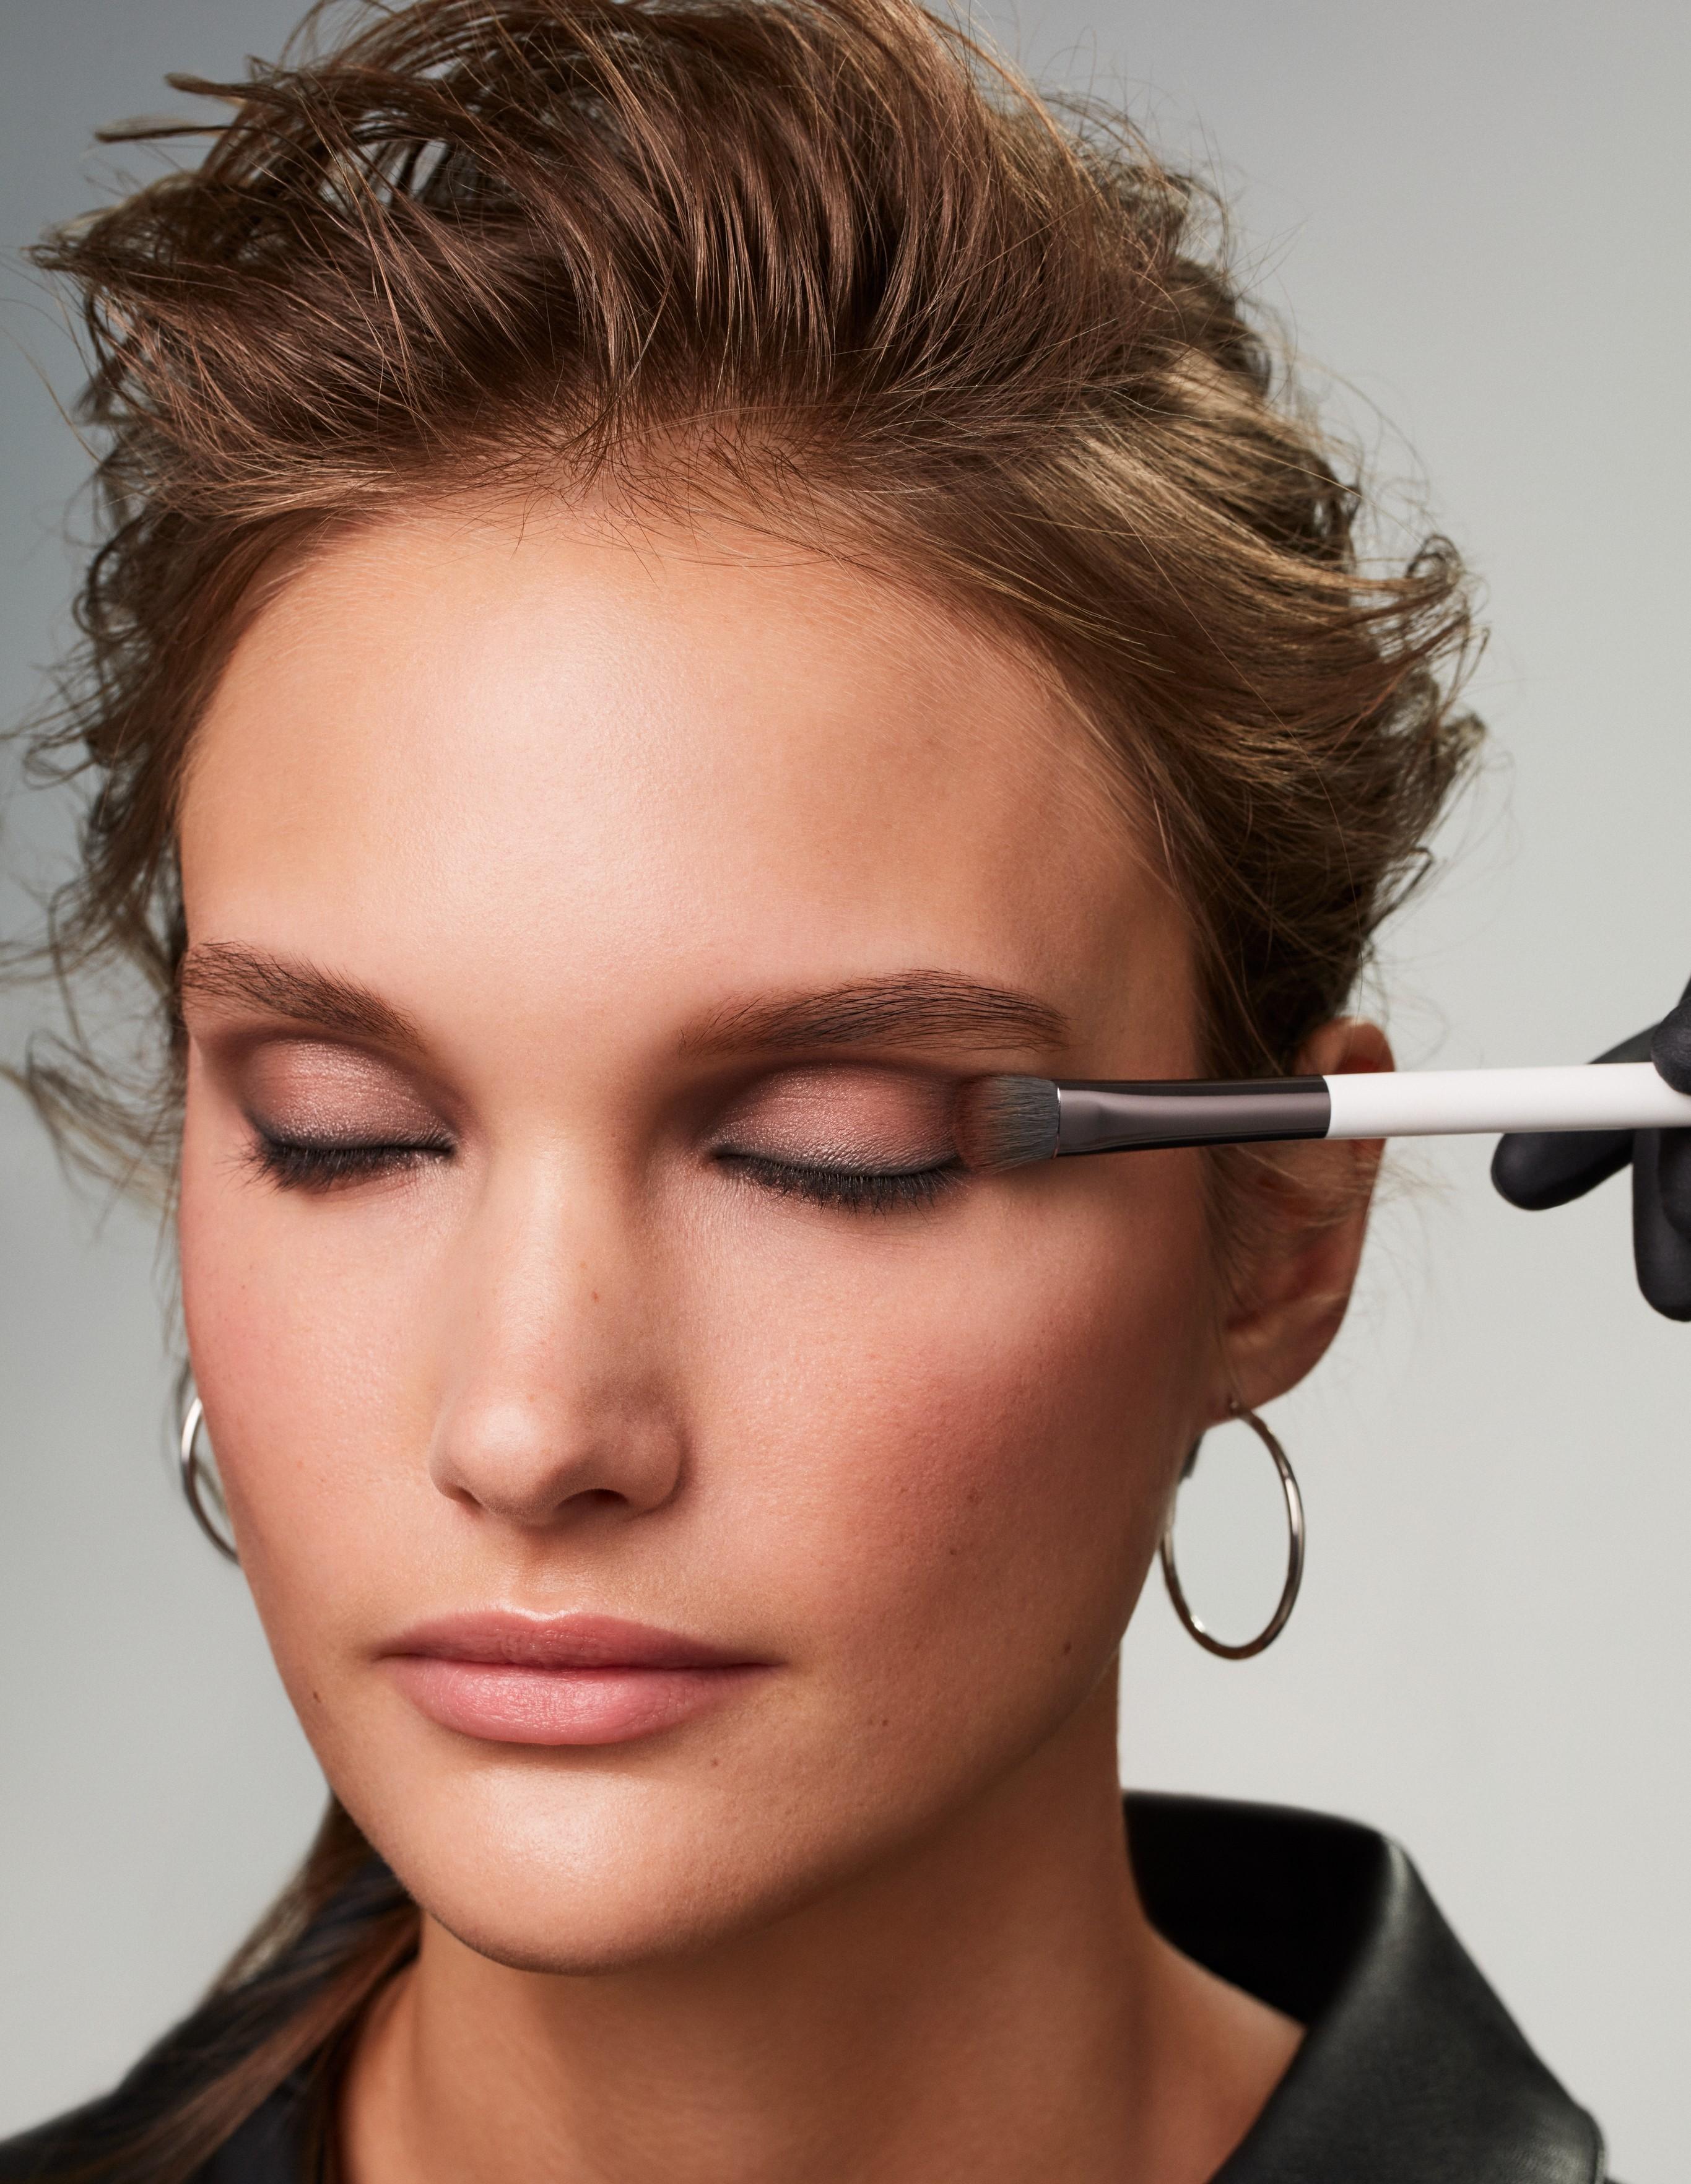 Makeup-application-3-smokey-eyes-062023-Web-Rendition